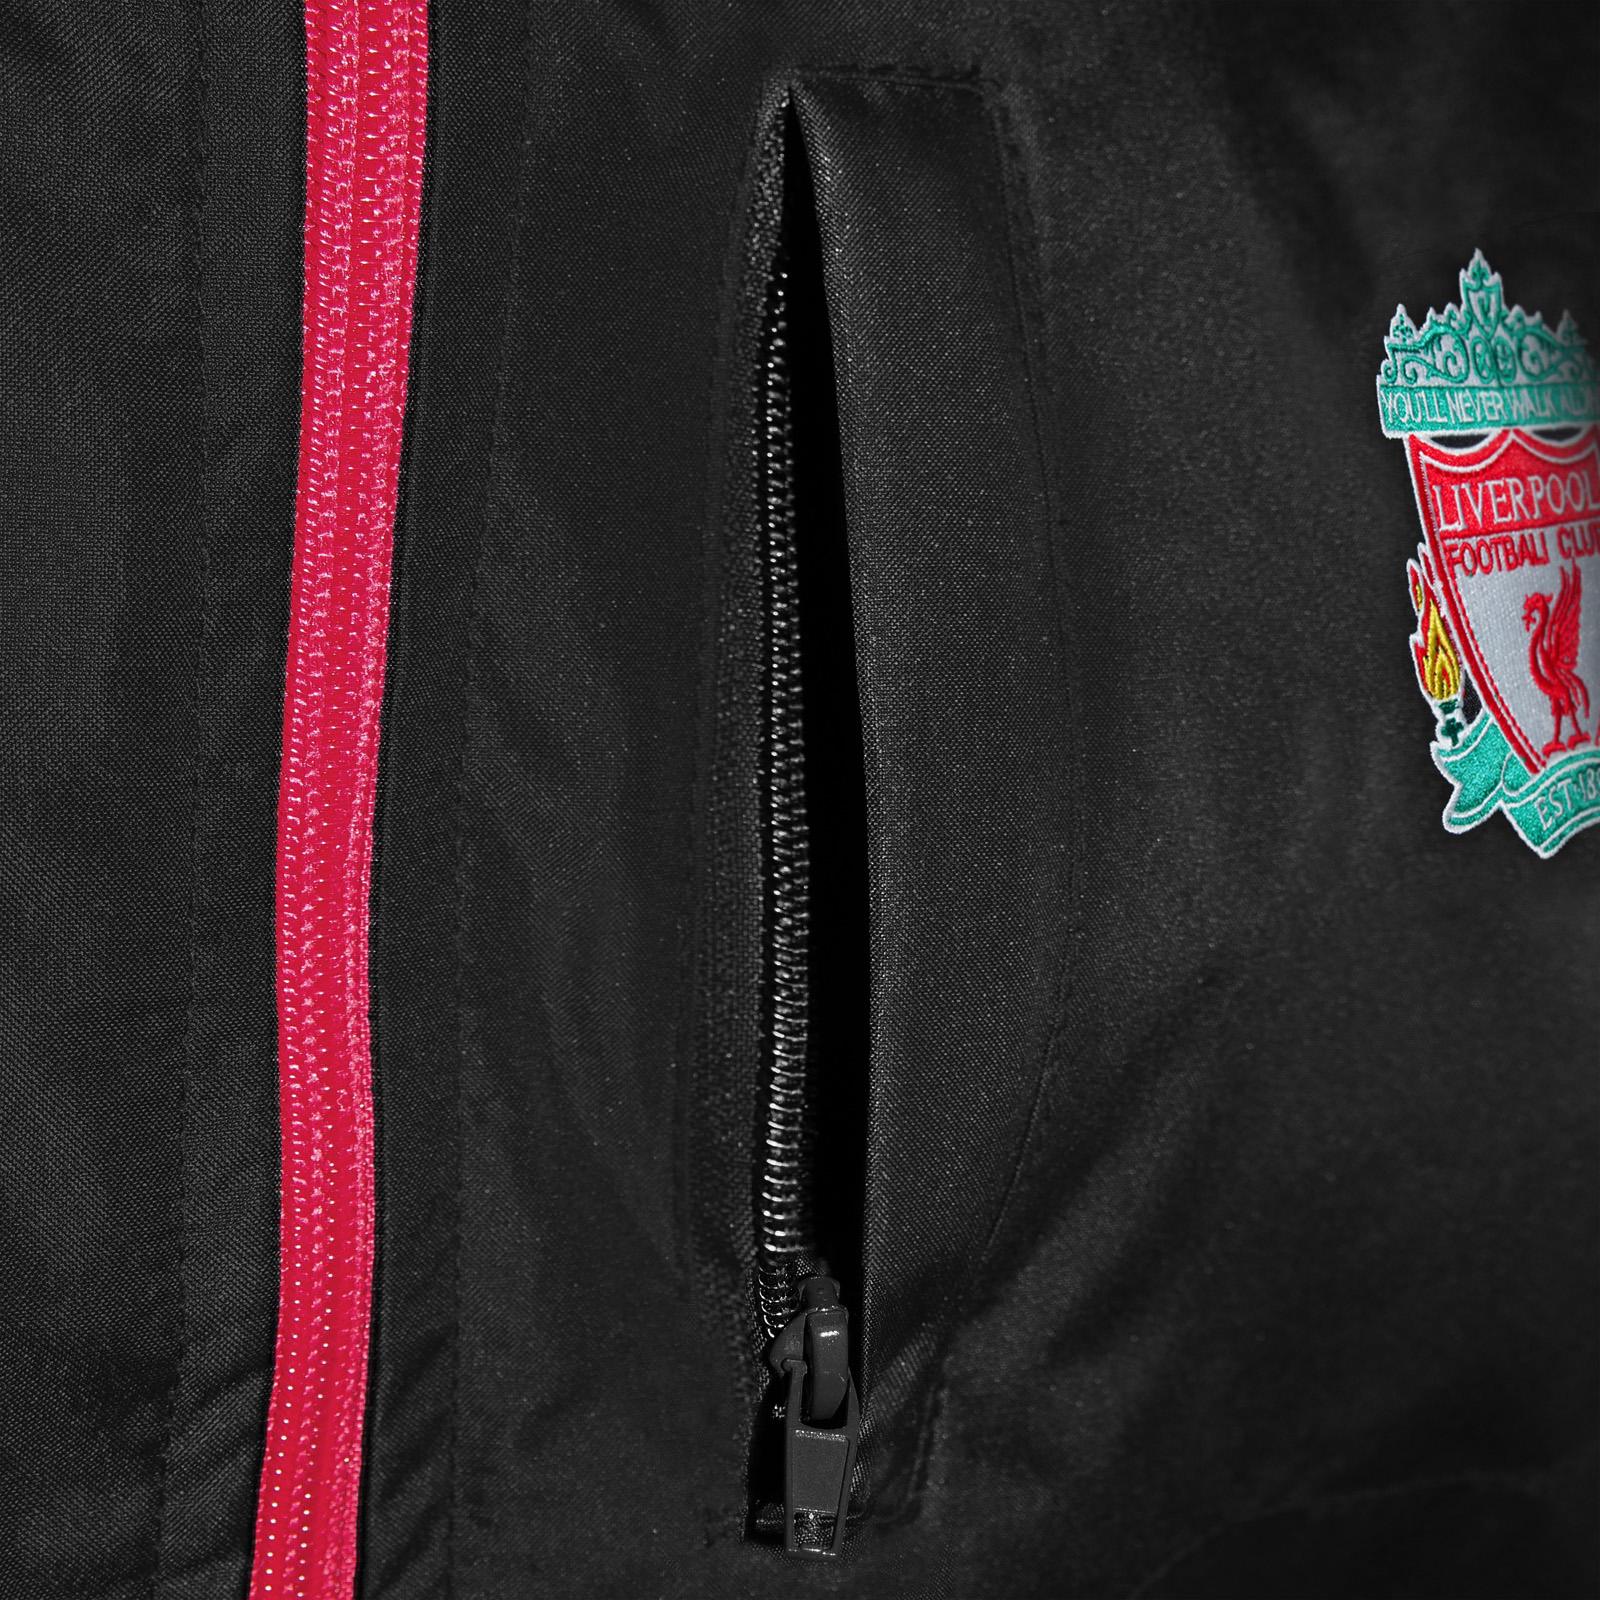 Liverpool Football Club Official Soccer Gift Mens Shower Jacket Windbreaker